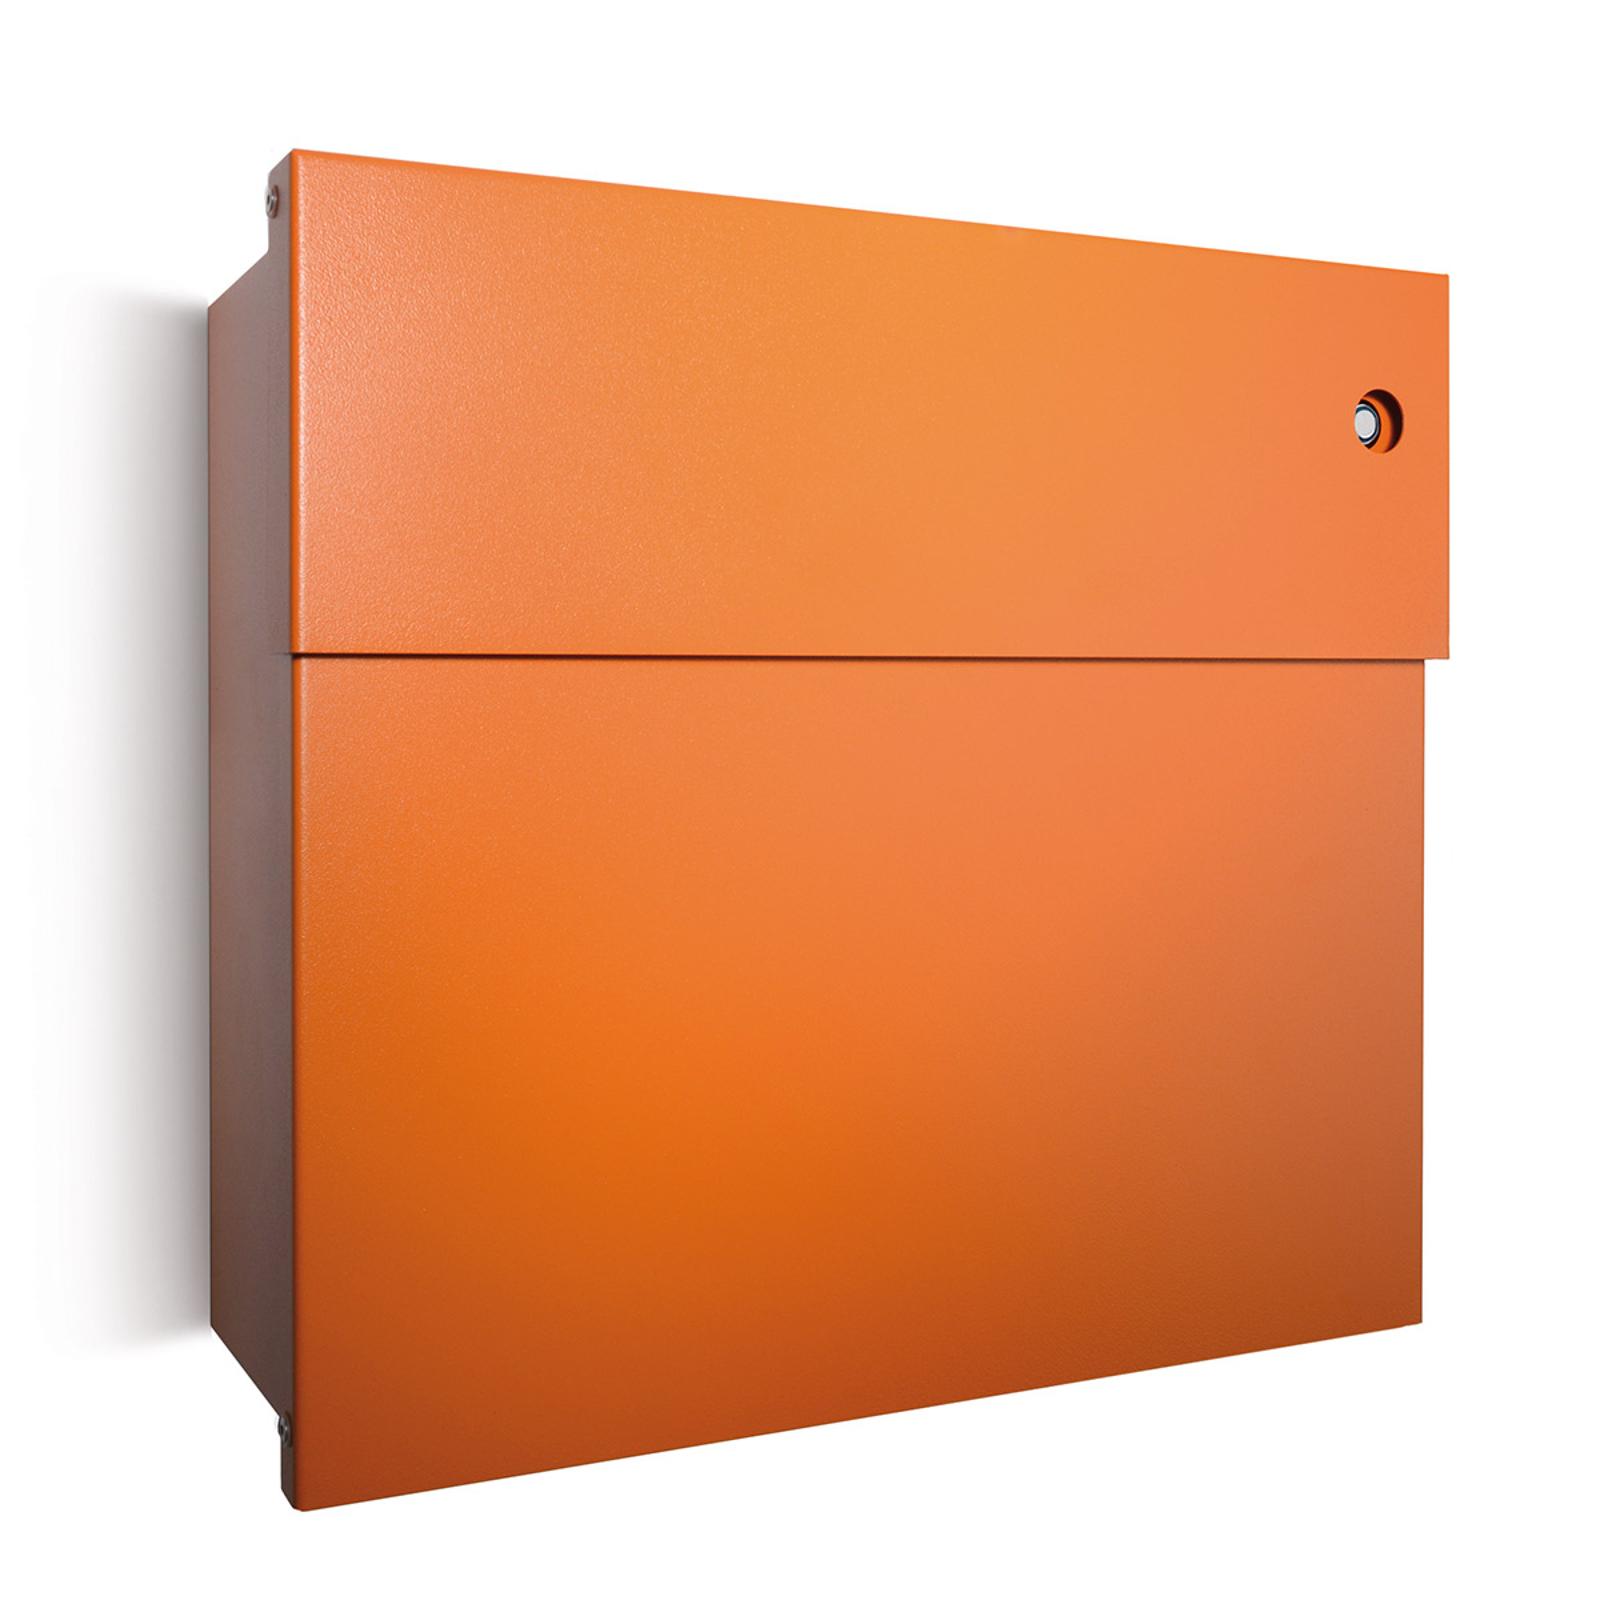 Letterman IV letterbox, blue doorbell, orange_1057149_1